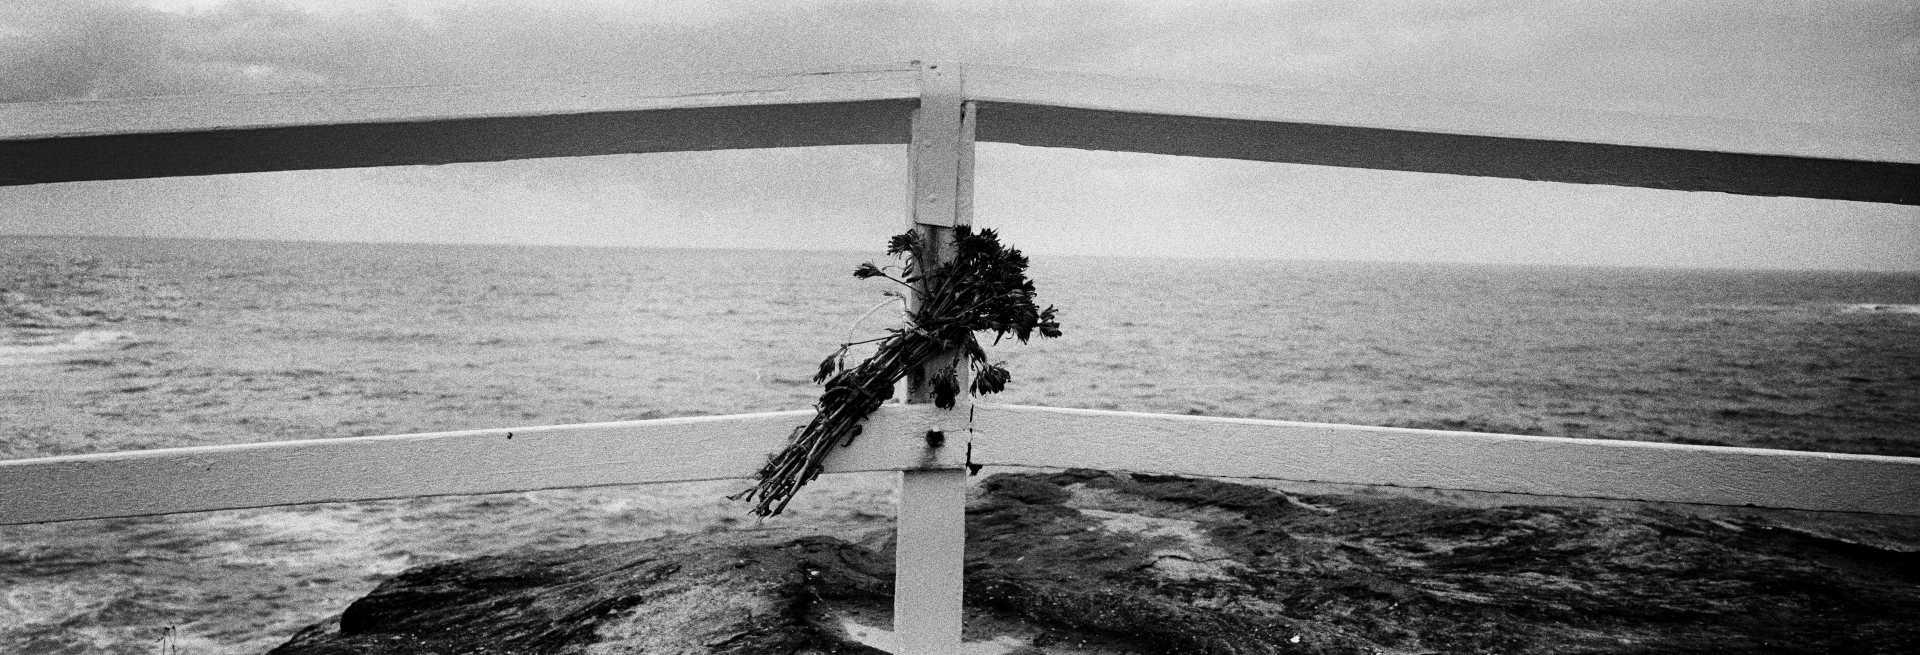 """Suicide Point"" Sydney, Australia."